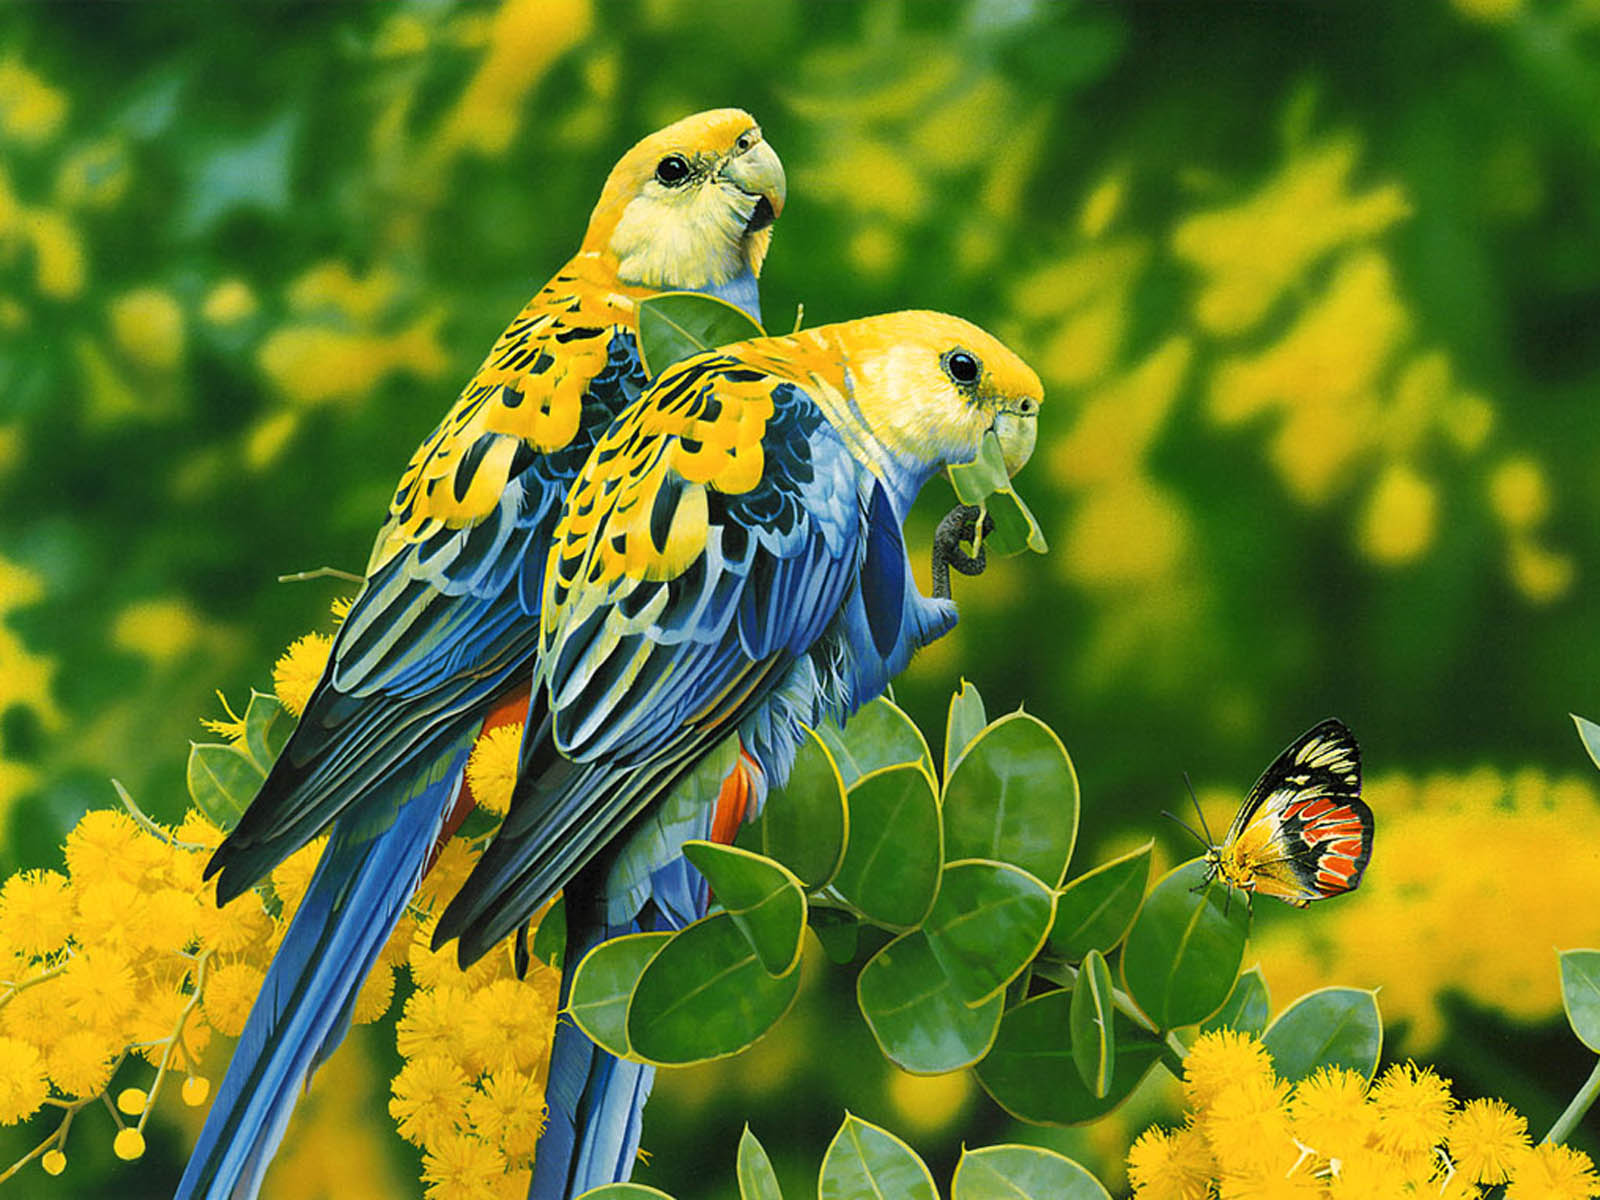 parrots wallpaper bird - photo #6